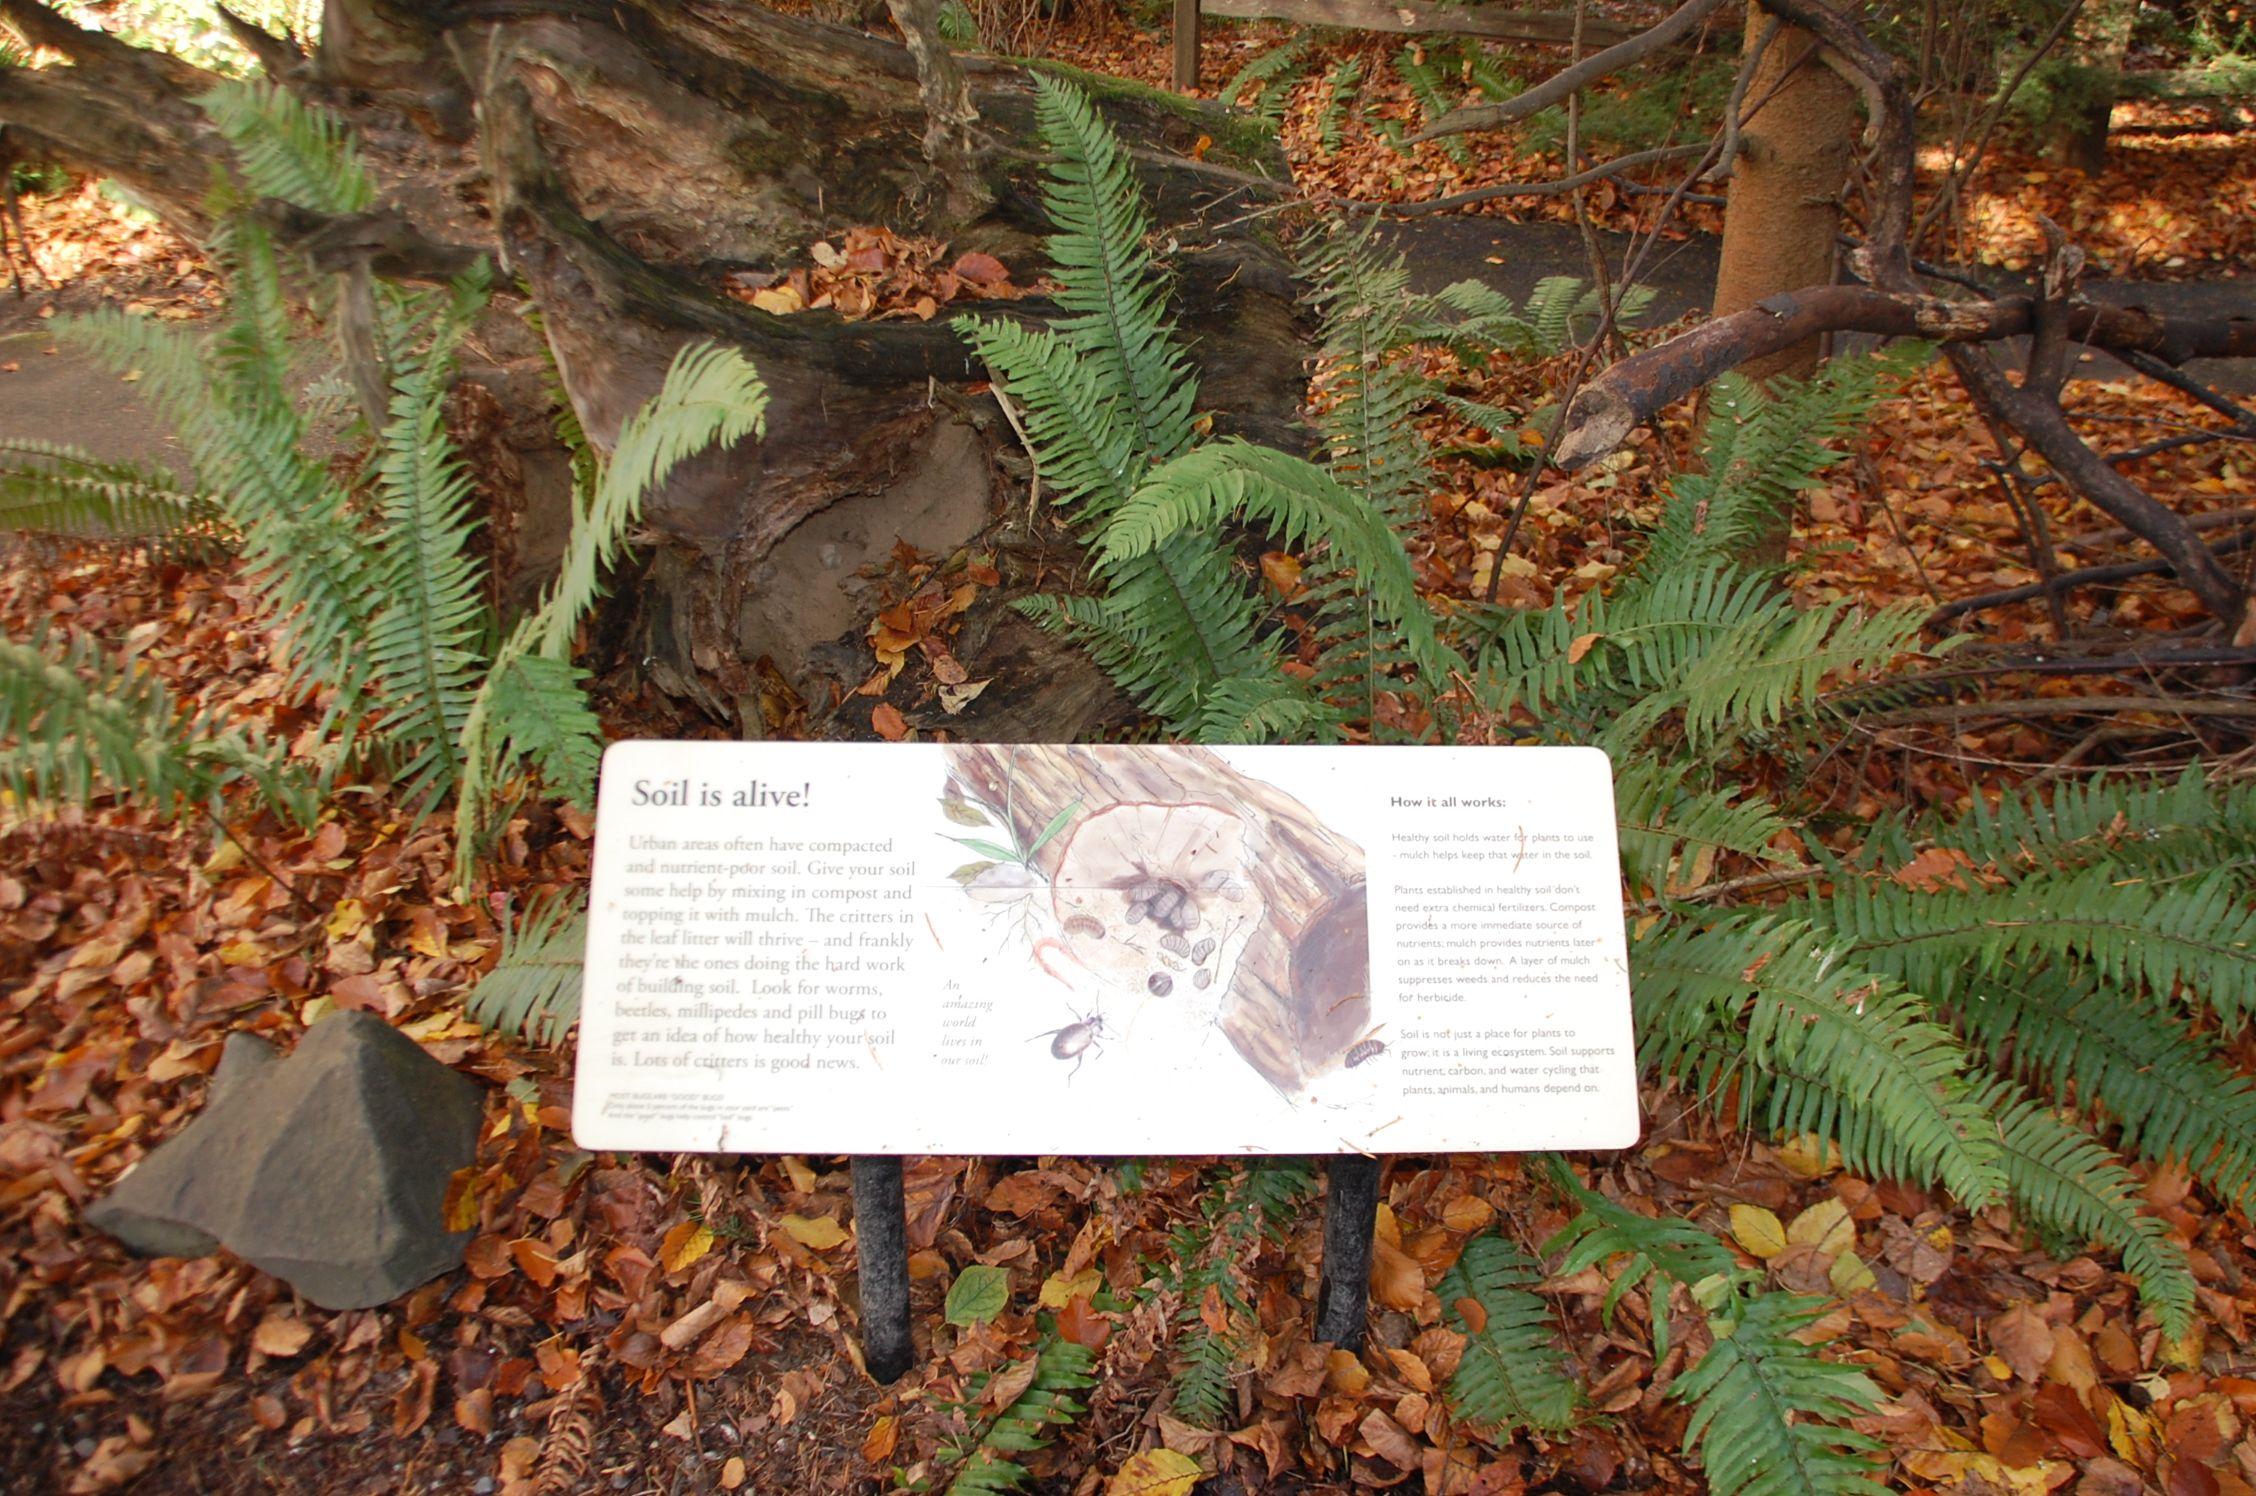 Soil Is Alive Habitat Garden Woodland Park Zoo Soil